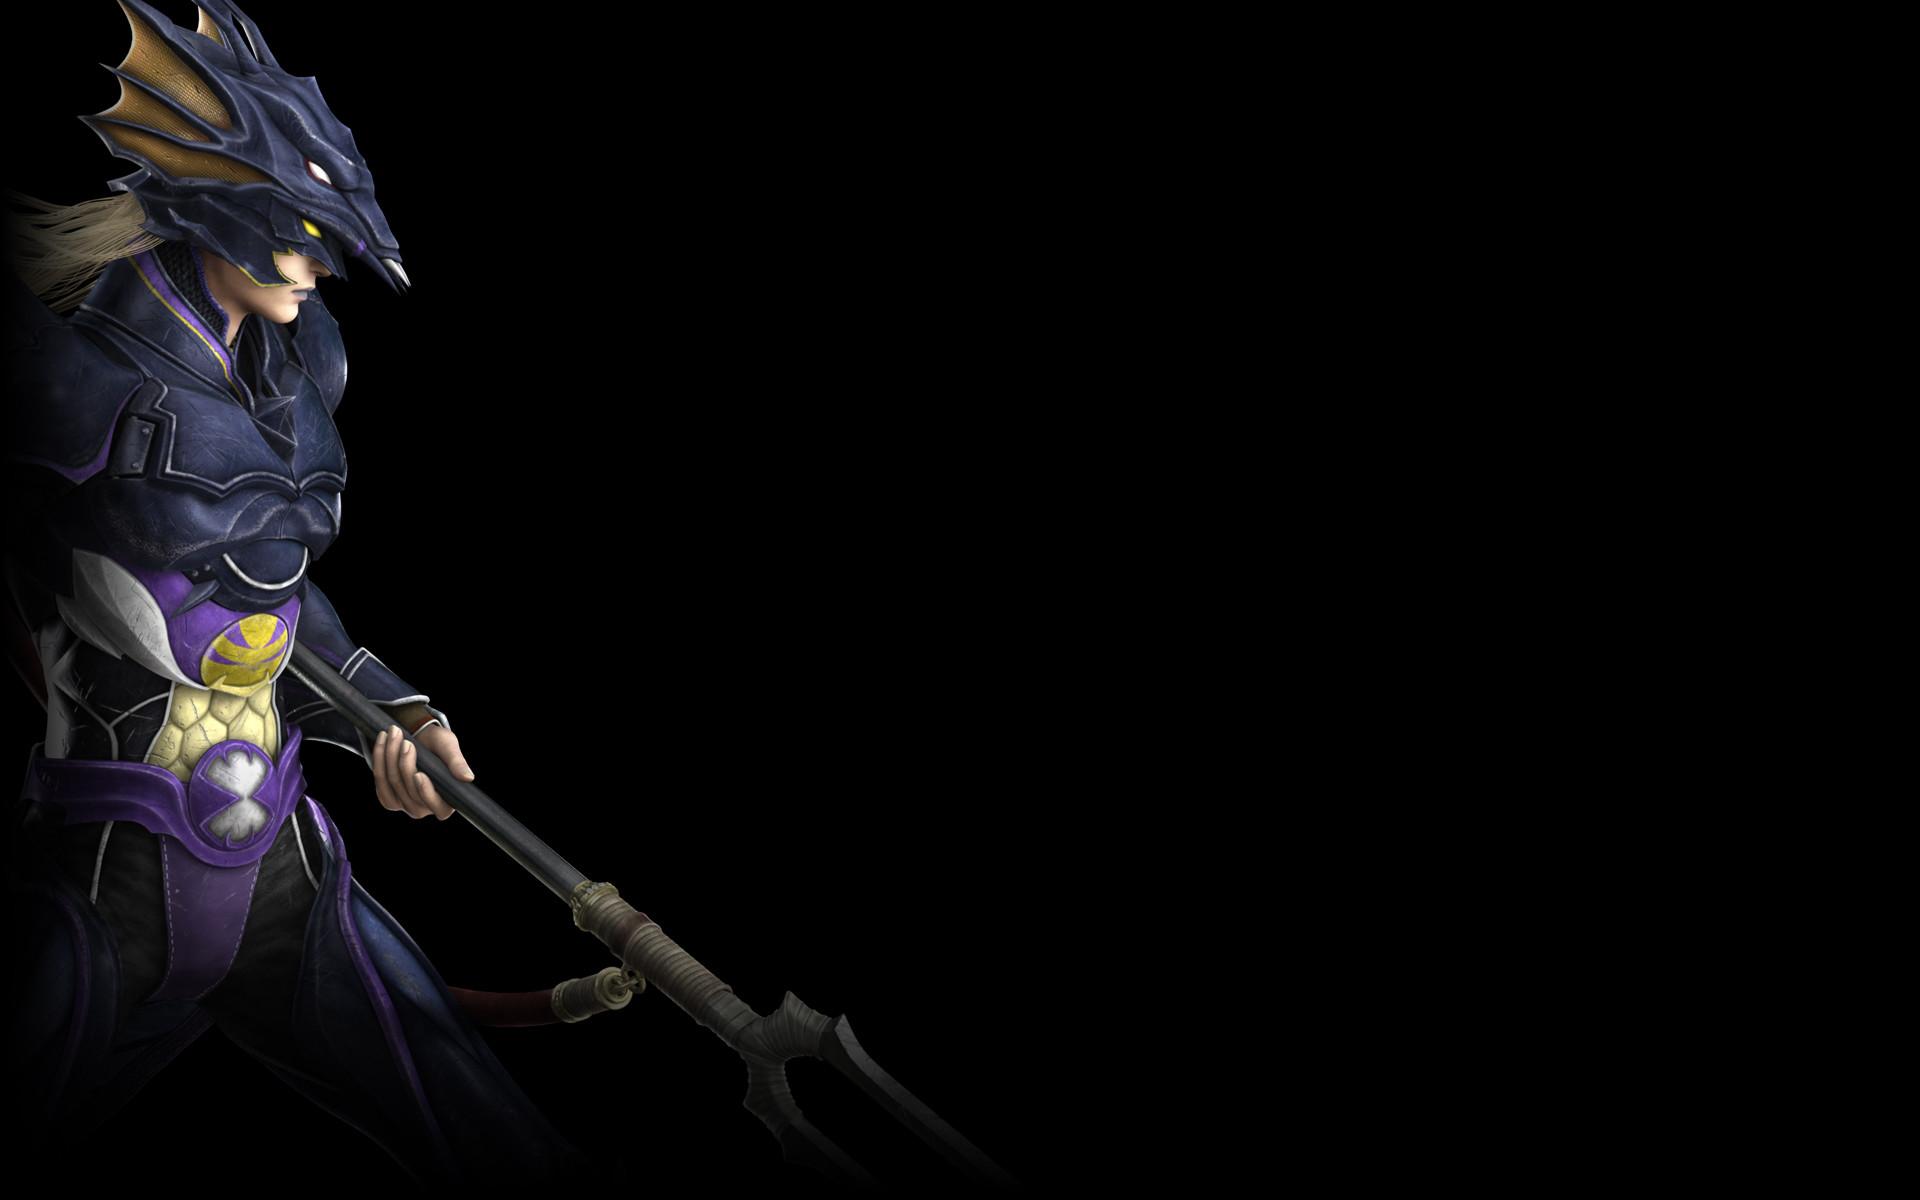 Final Fantasy IV Wallpaper 005 – Kain